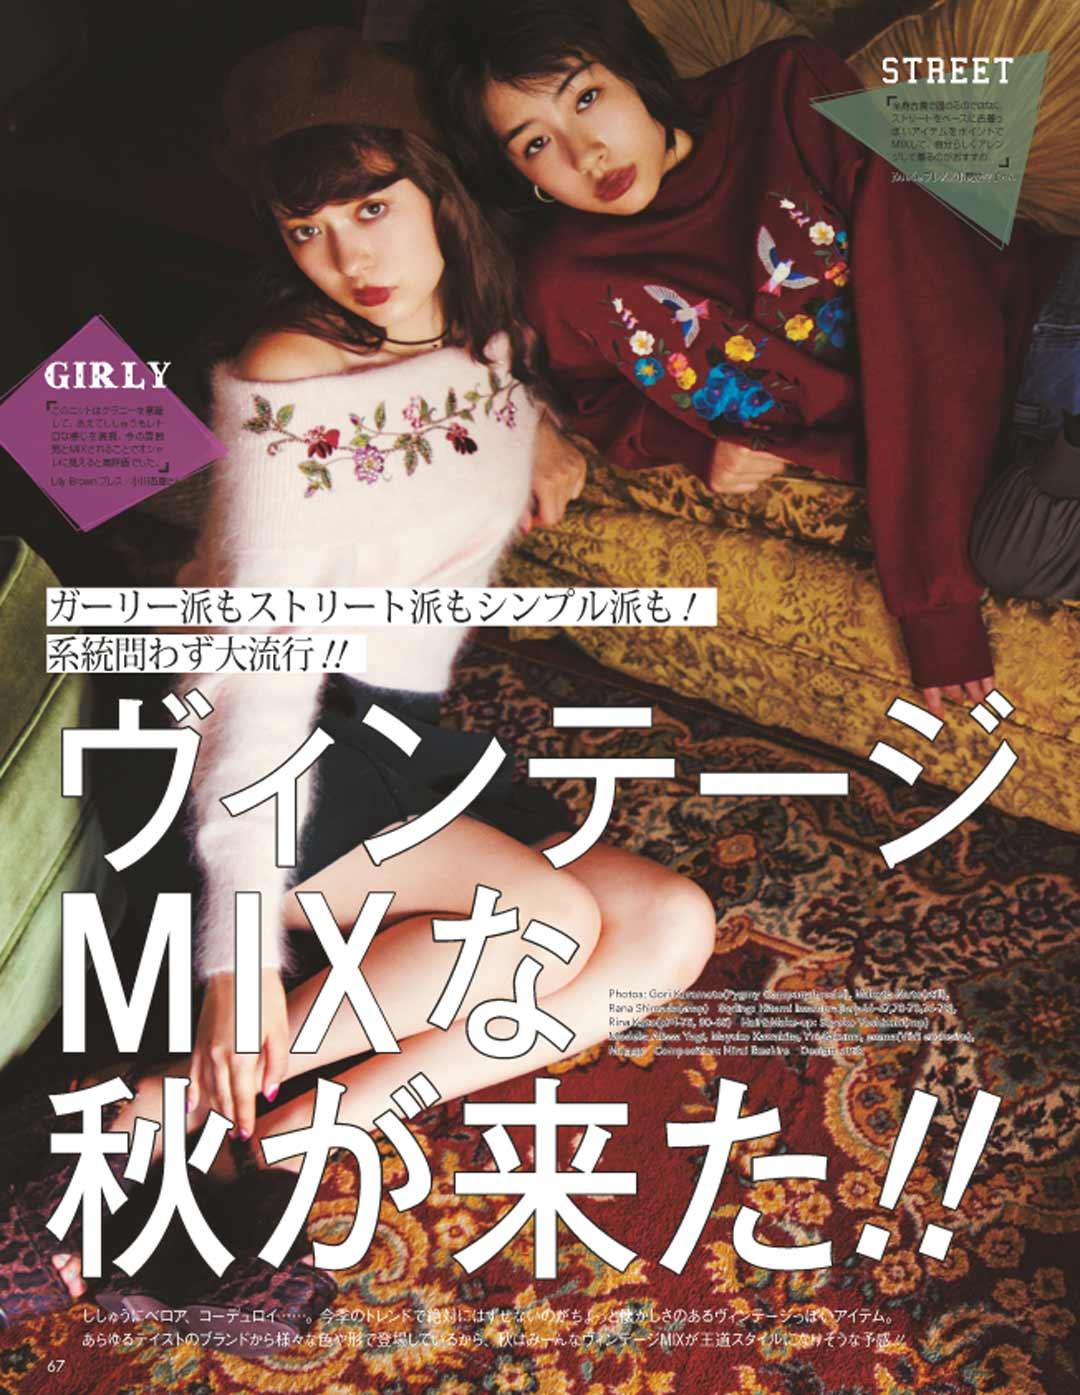 ViVi 11月号P.67『ヴィンテージMIXな秋が来た!!』掲載